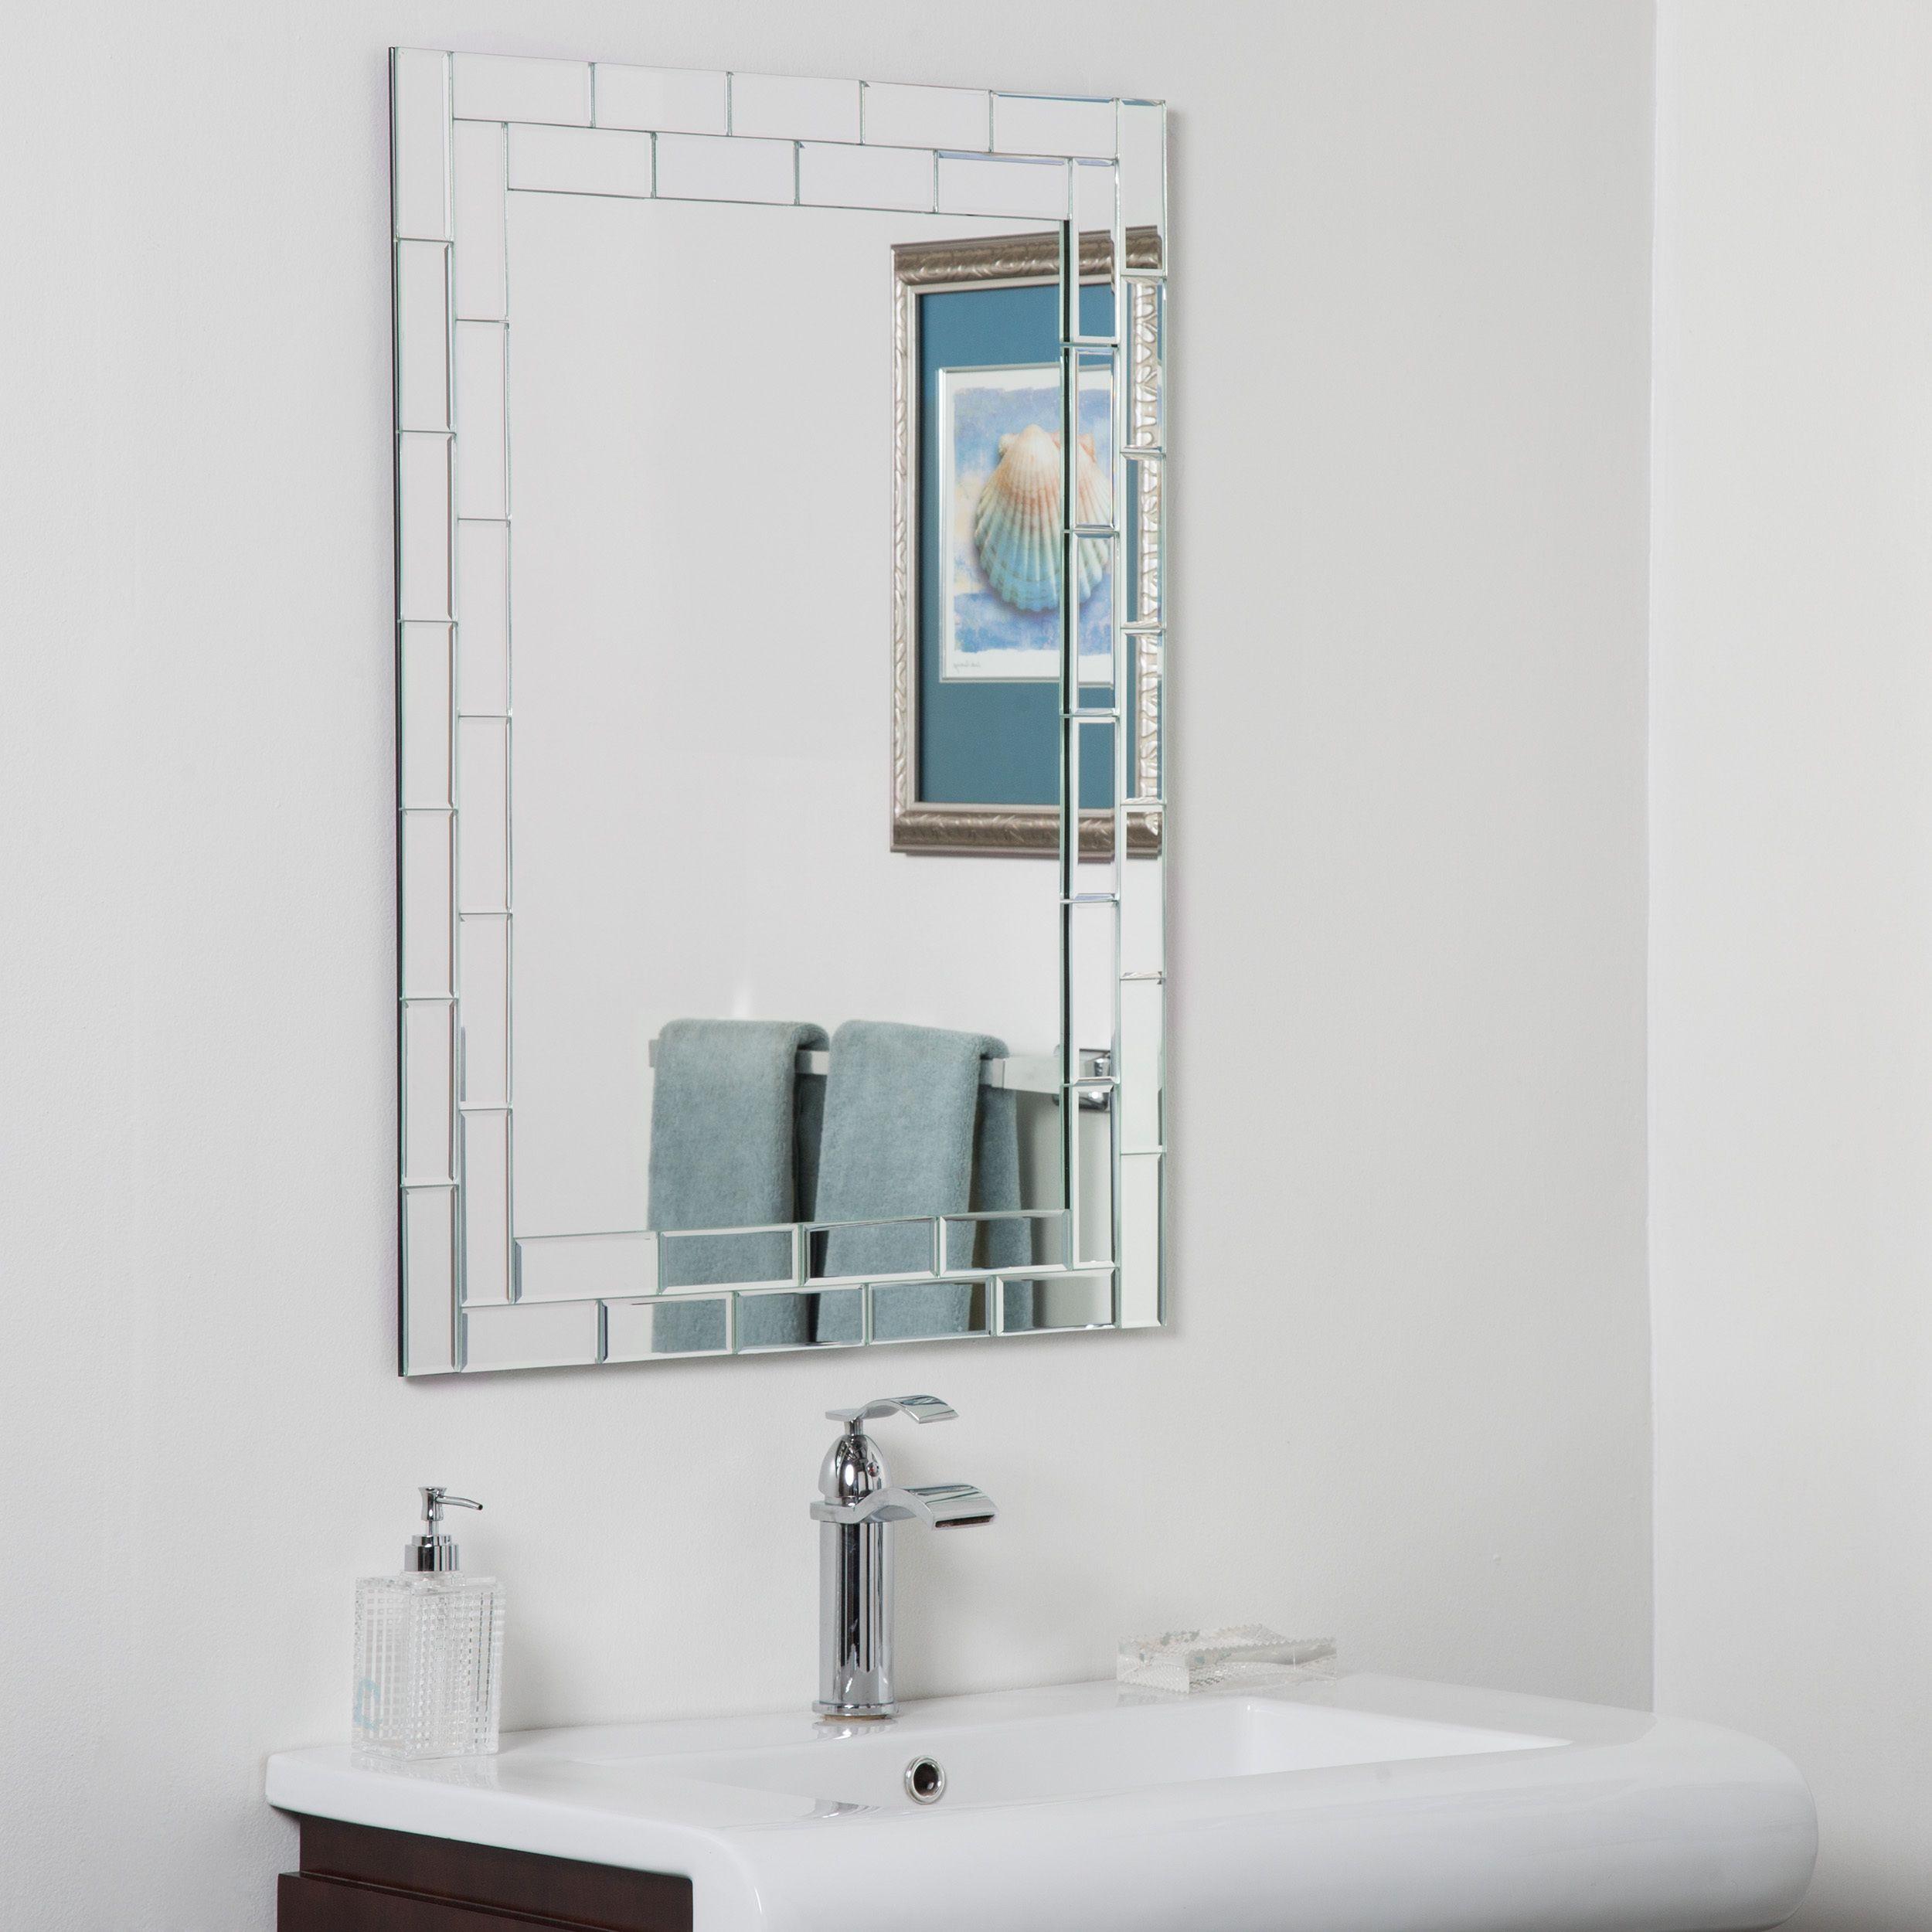 Decor Wonderland Grand Street Beveled Glass Frameless Bathroom Classy Bathroom Wall Mirrors 2018